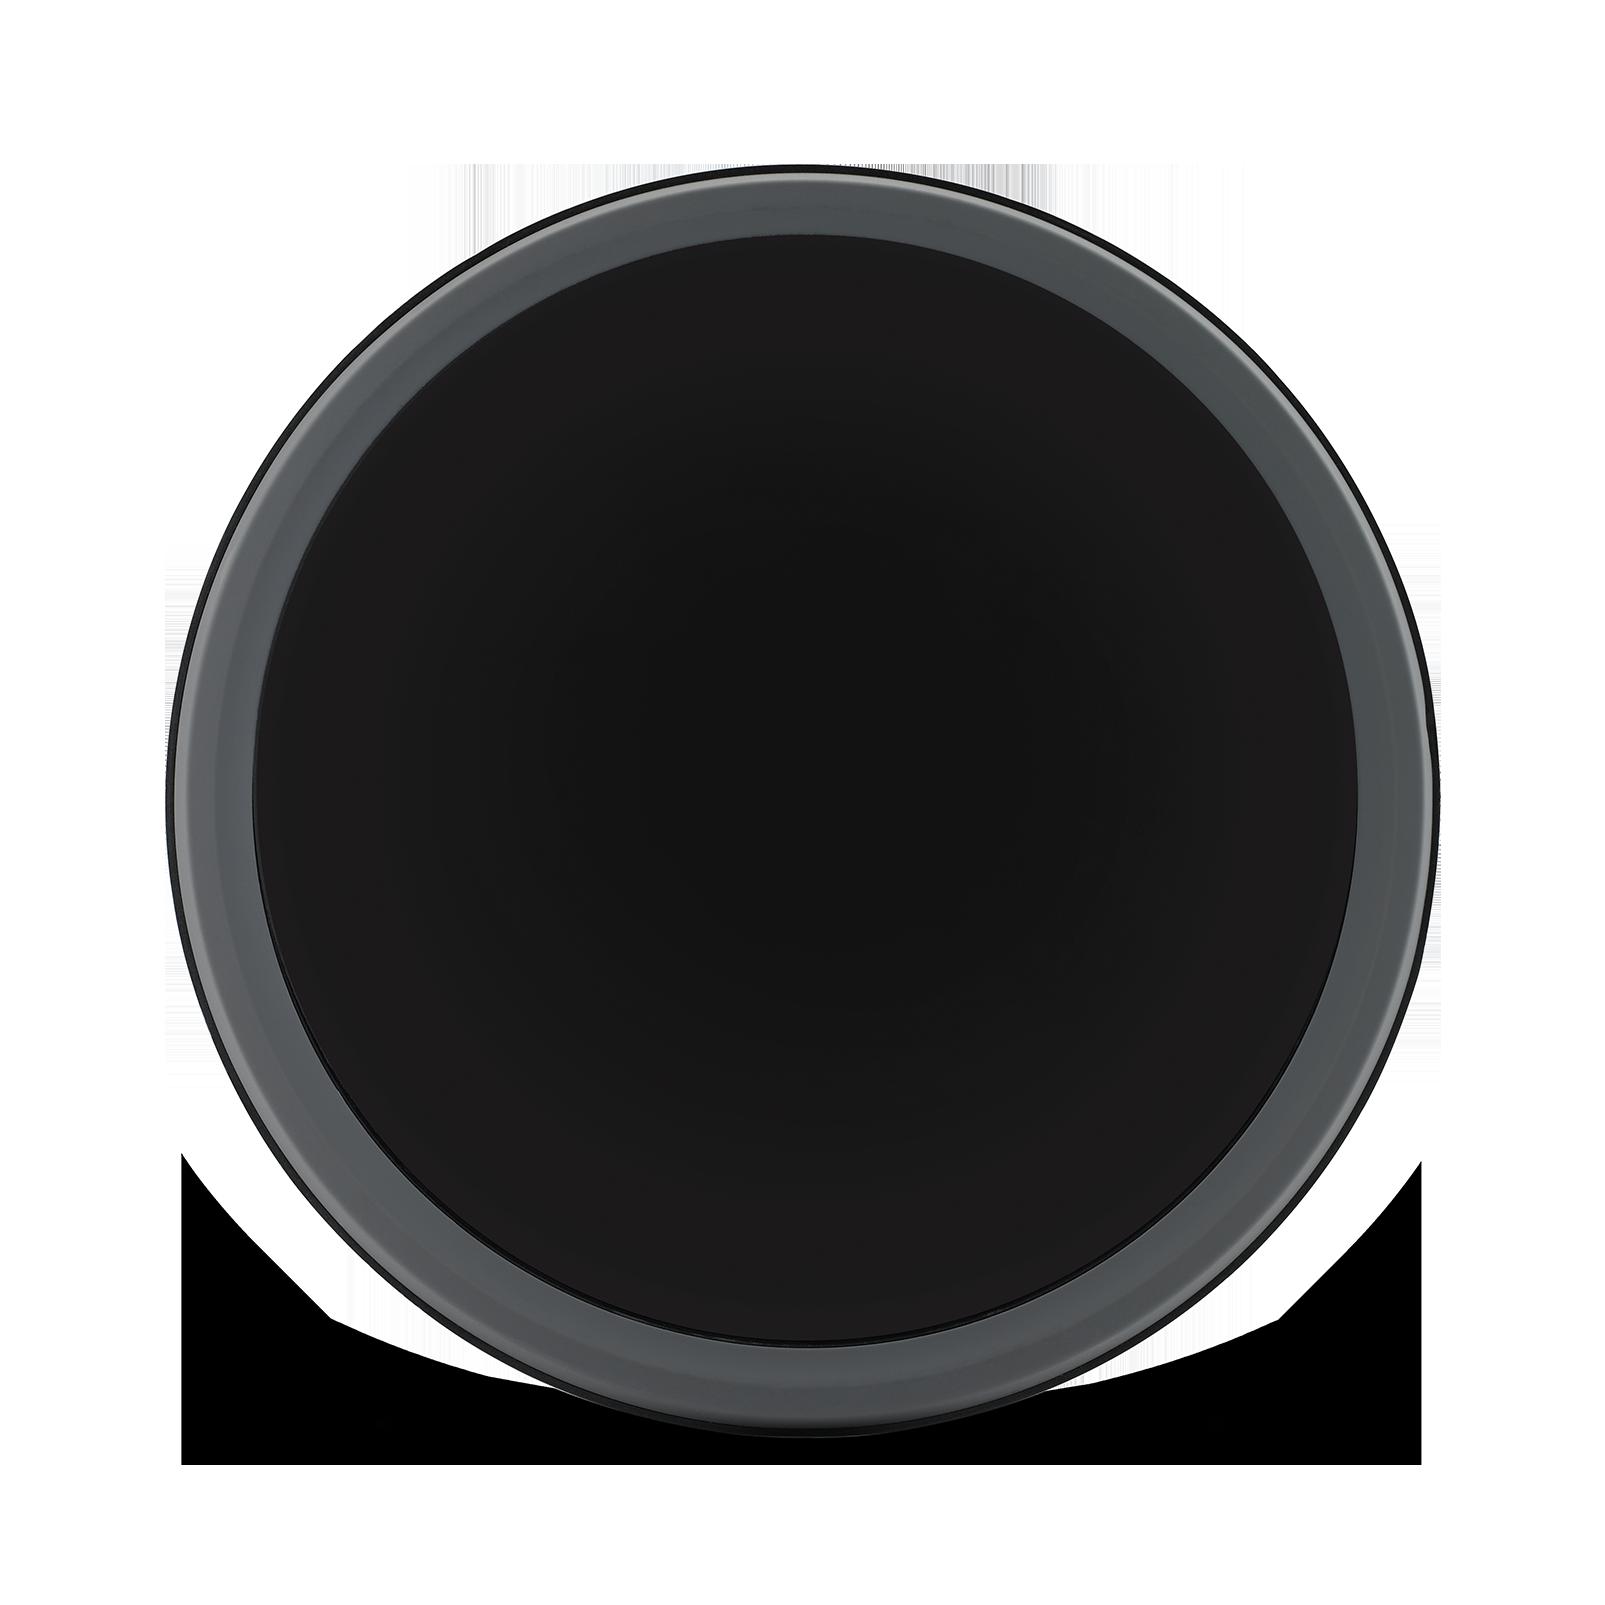 Harman Kardon Citation Sub - Black - Thundering bass for movies and music - Detailshot 4